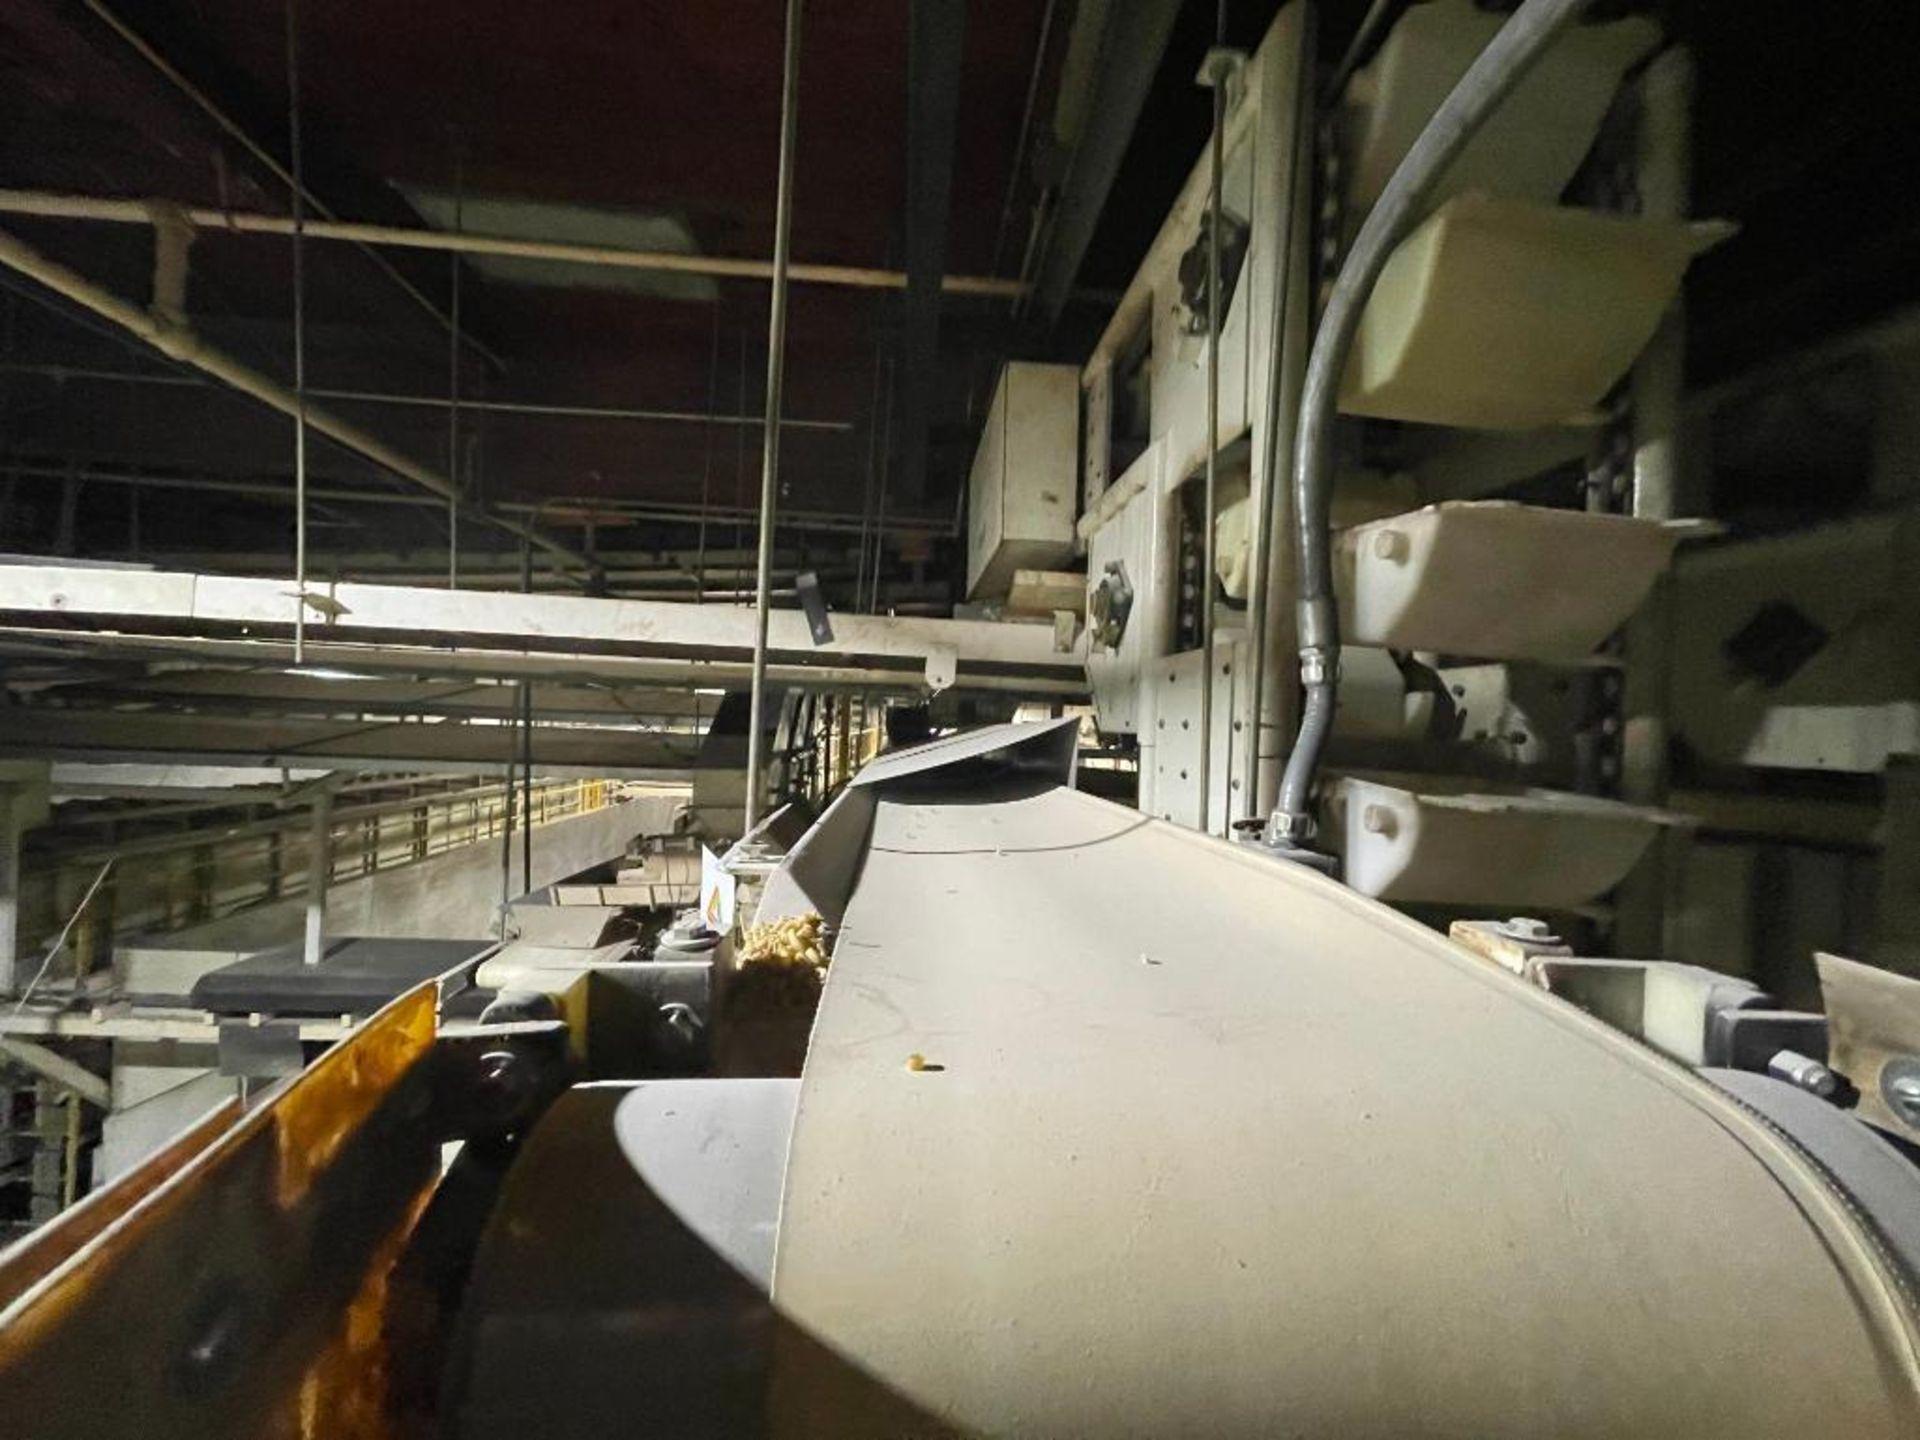 2 Aseeco horizontal overhead mild steel belt conveyors - Image 3 of 9